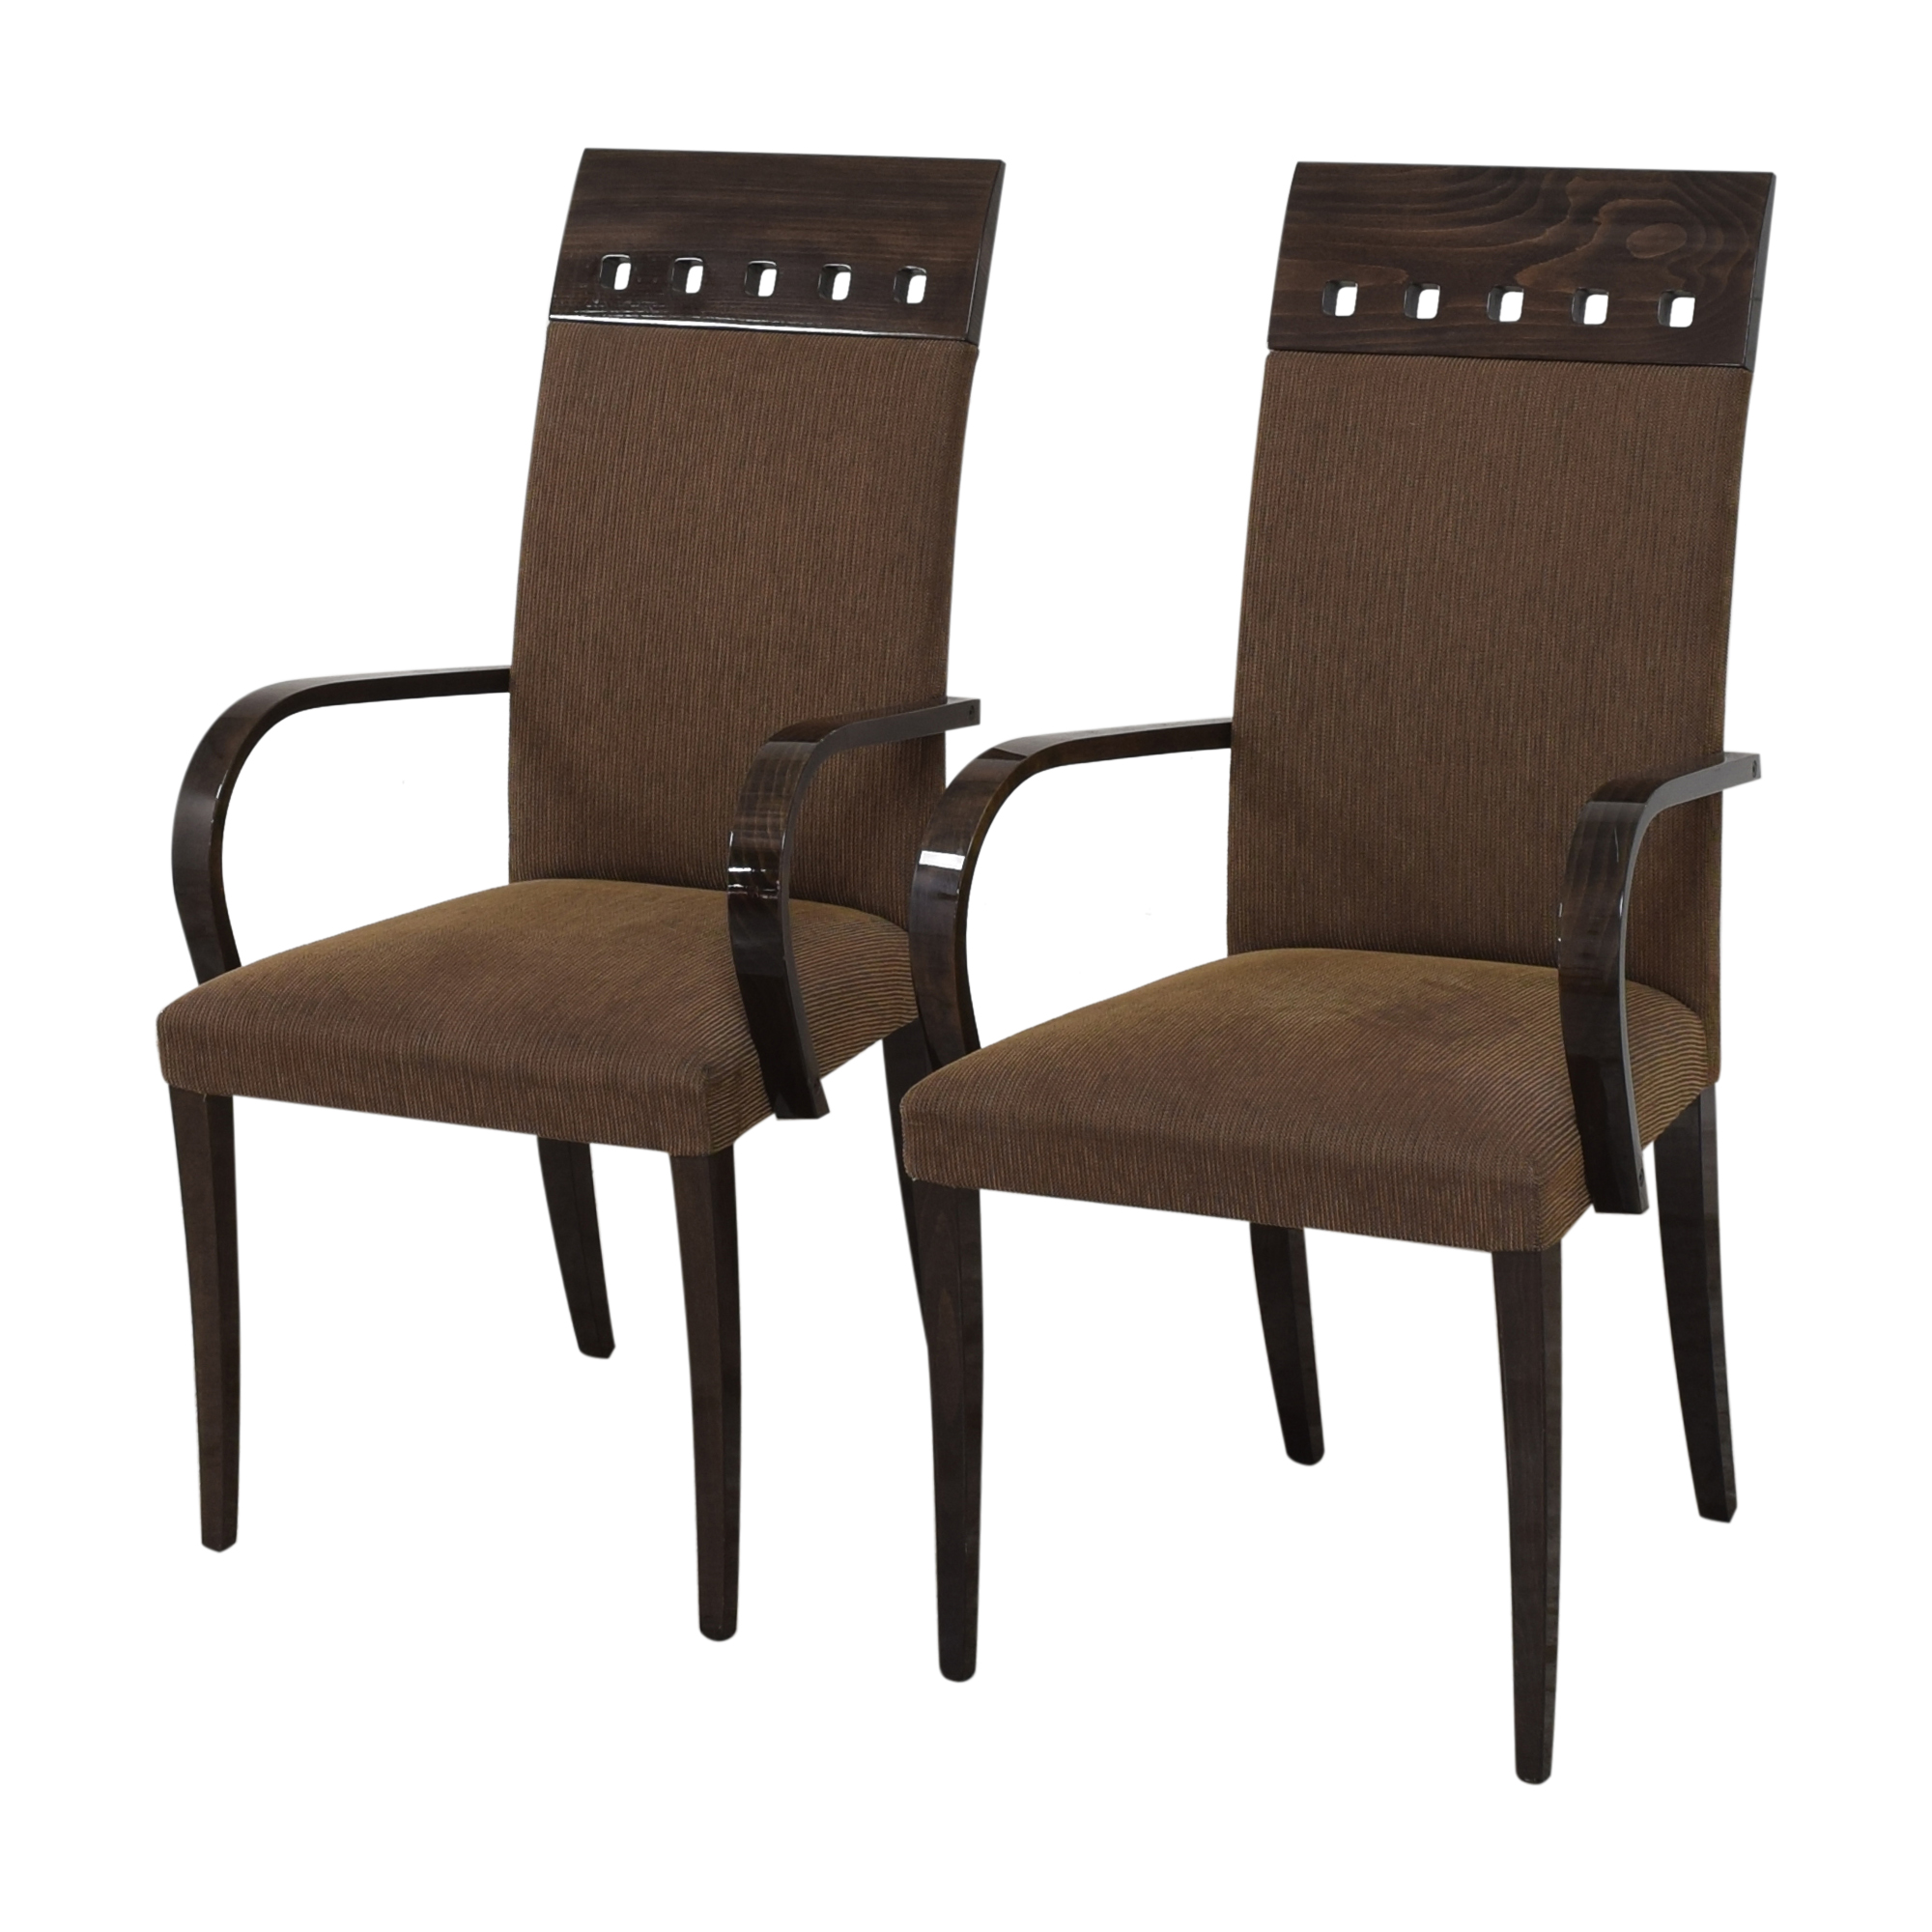 Pietro Costantini Pietro Costantini High Back Dining Arm Chairs brown